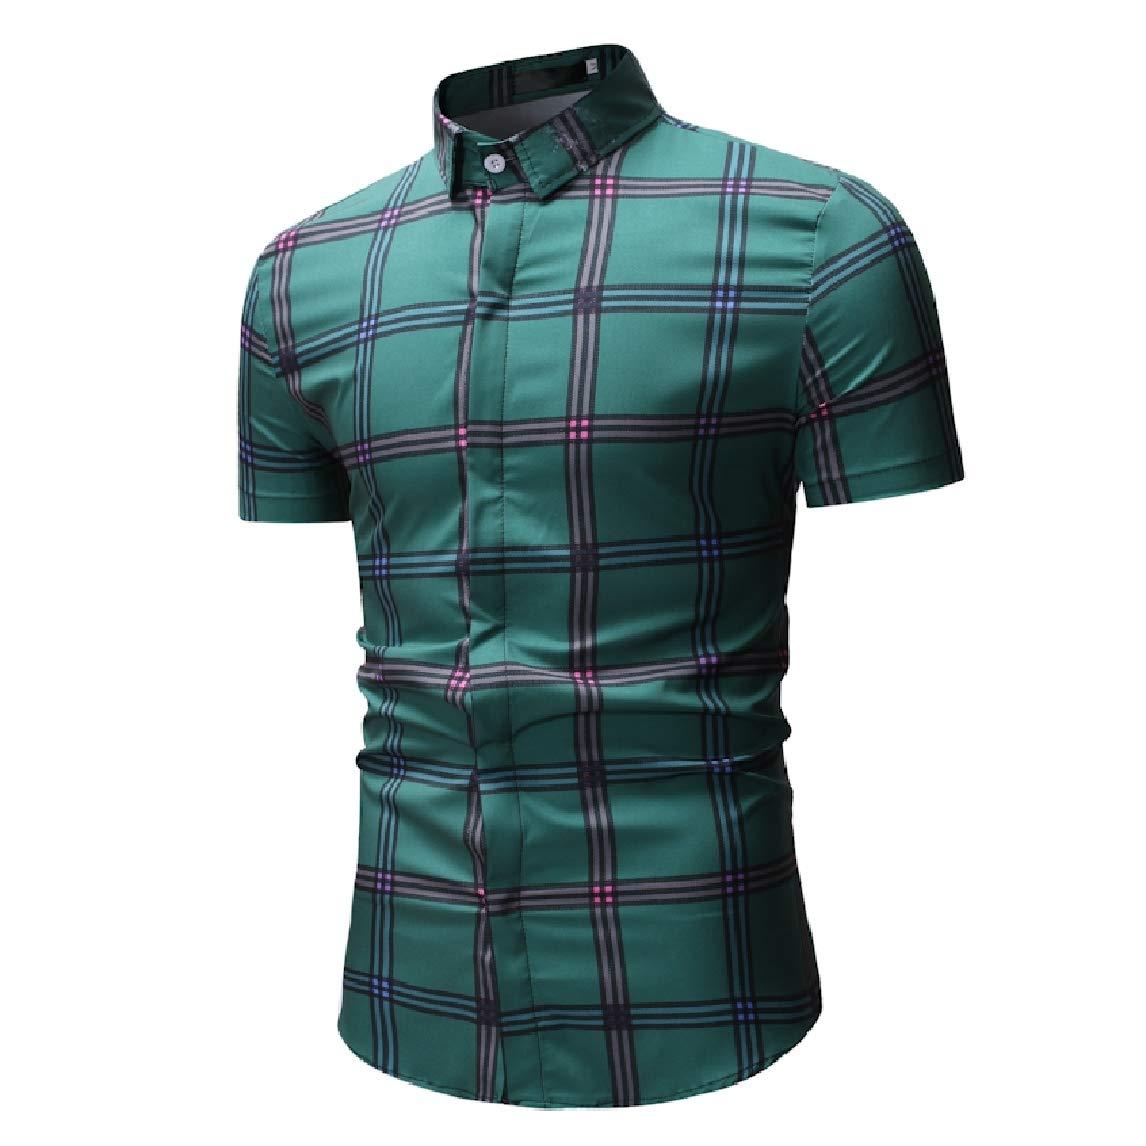 Mfasica Men Plaid Pattern Square Collor Casual Short-Sleeve Shirt